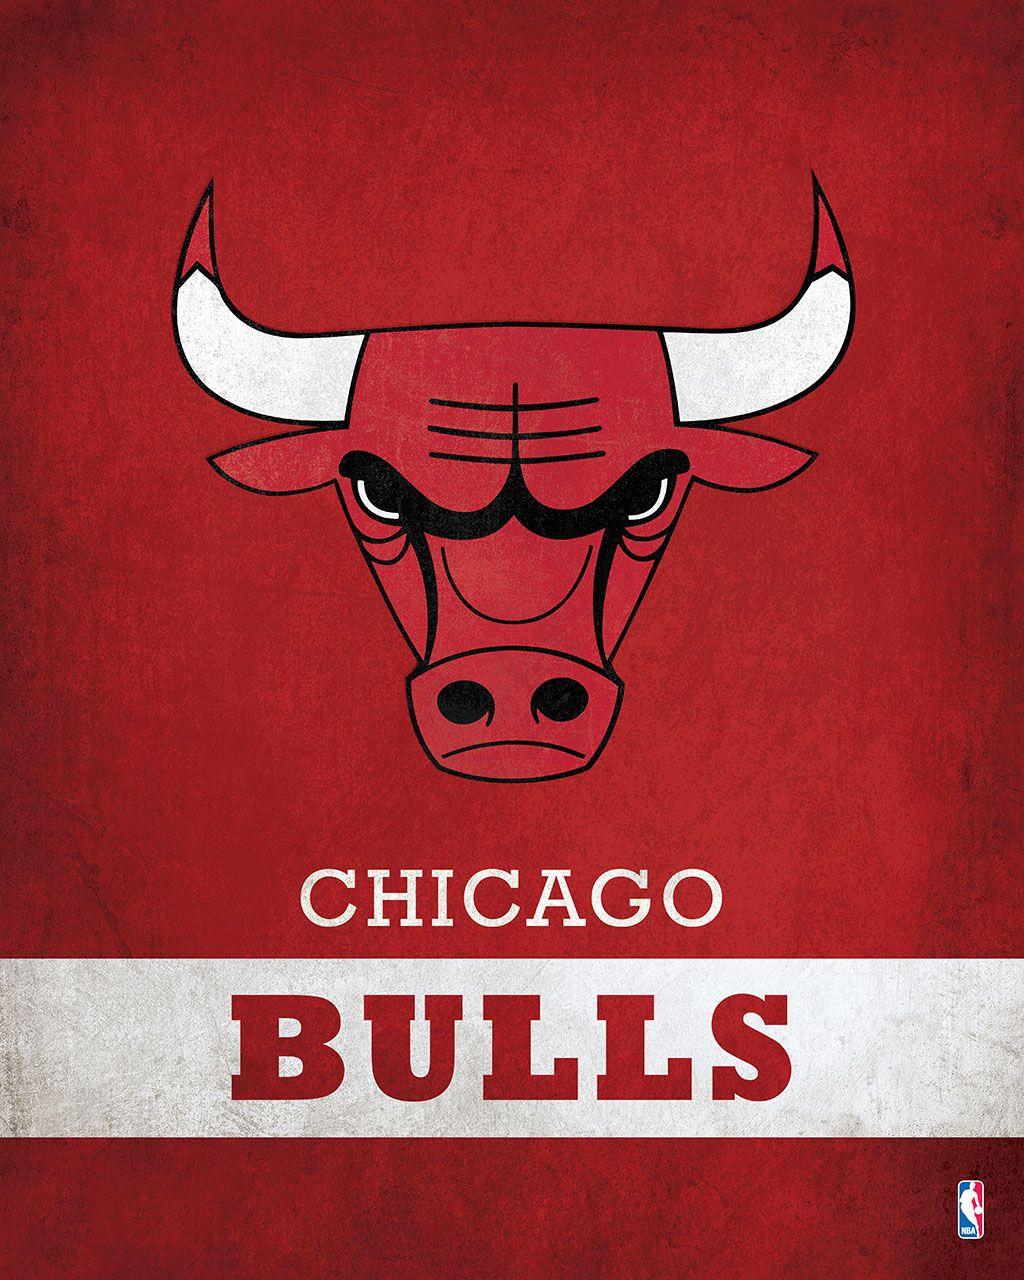 Chicago bulls logo 2499 nba pinterest chicago bulls chicago bulls logo 2499 voltagebd Images